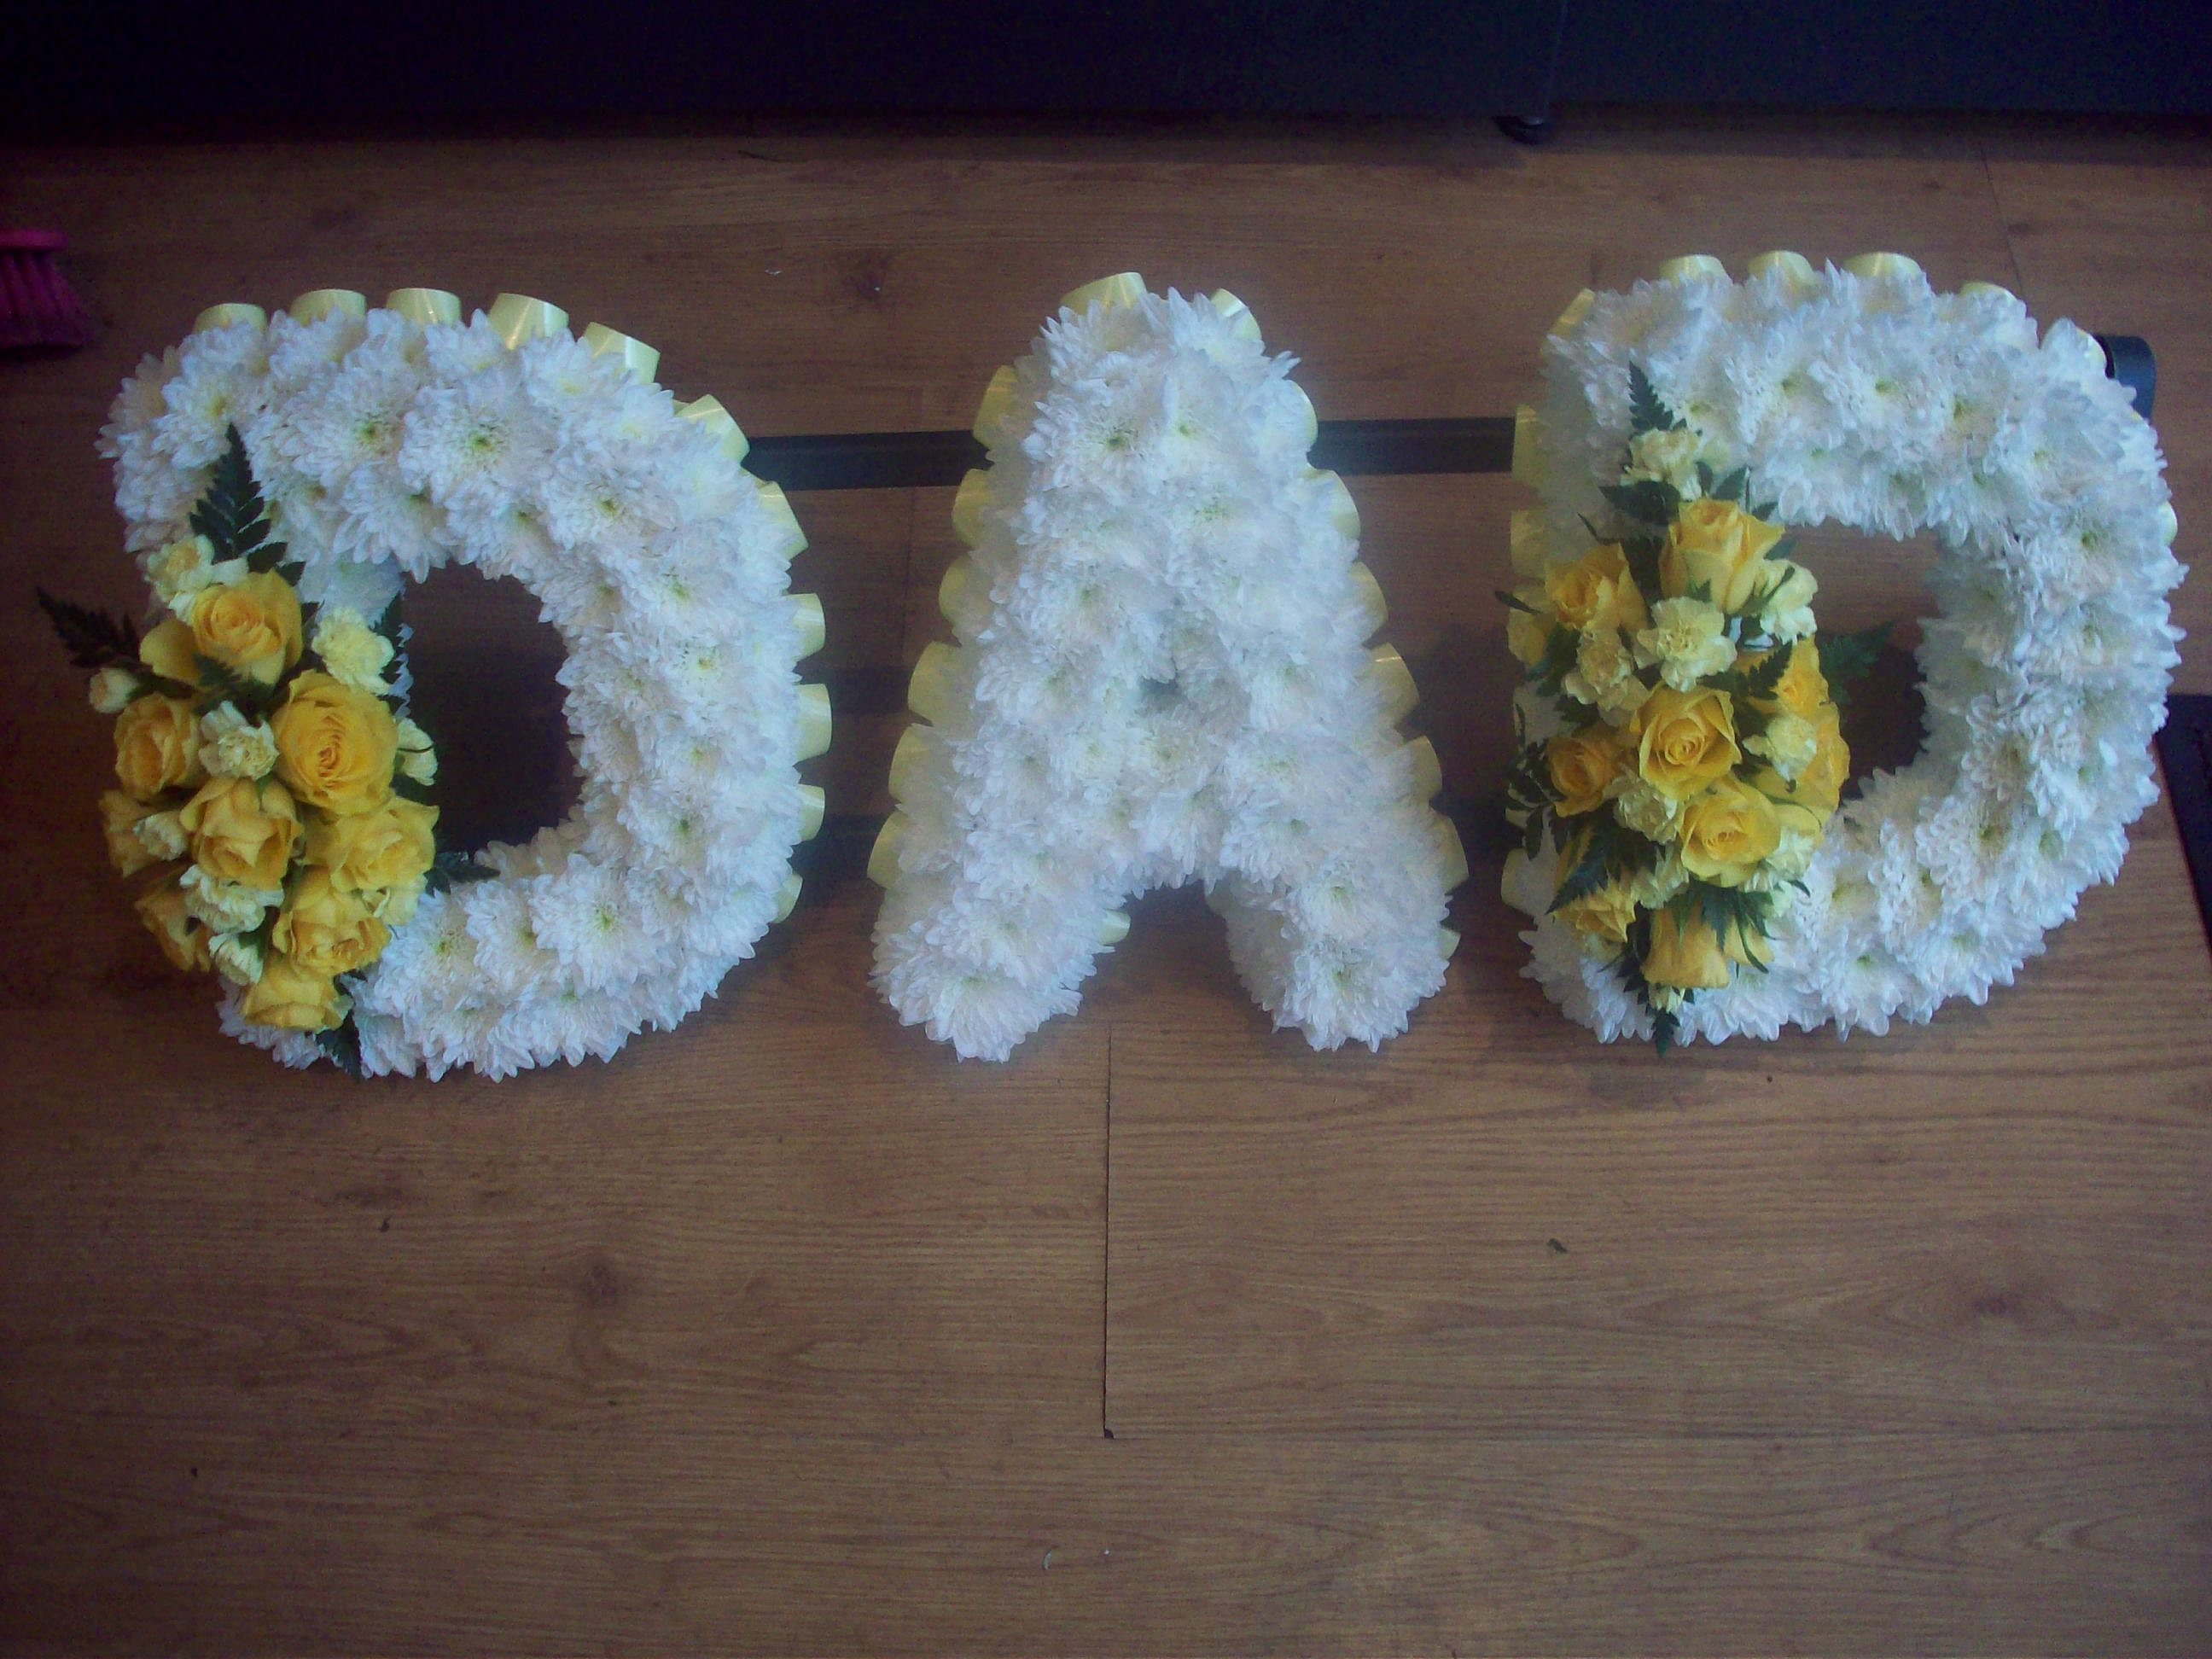 Karens Florist Wedding And Funeral Funeral Tribute Dad